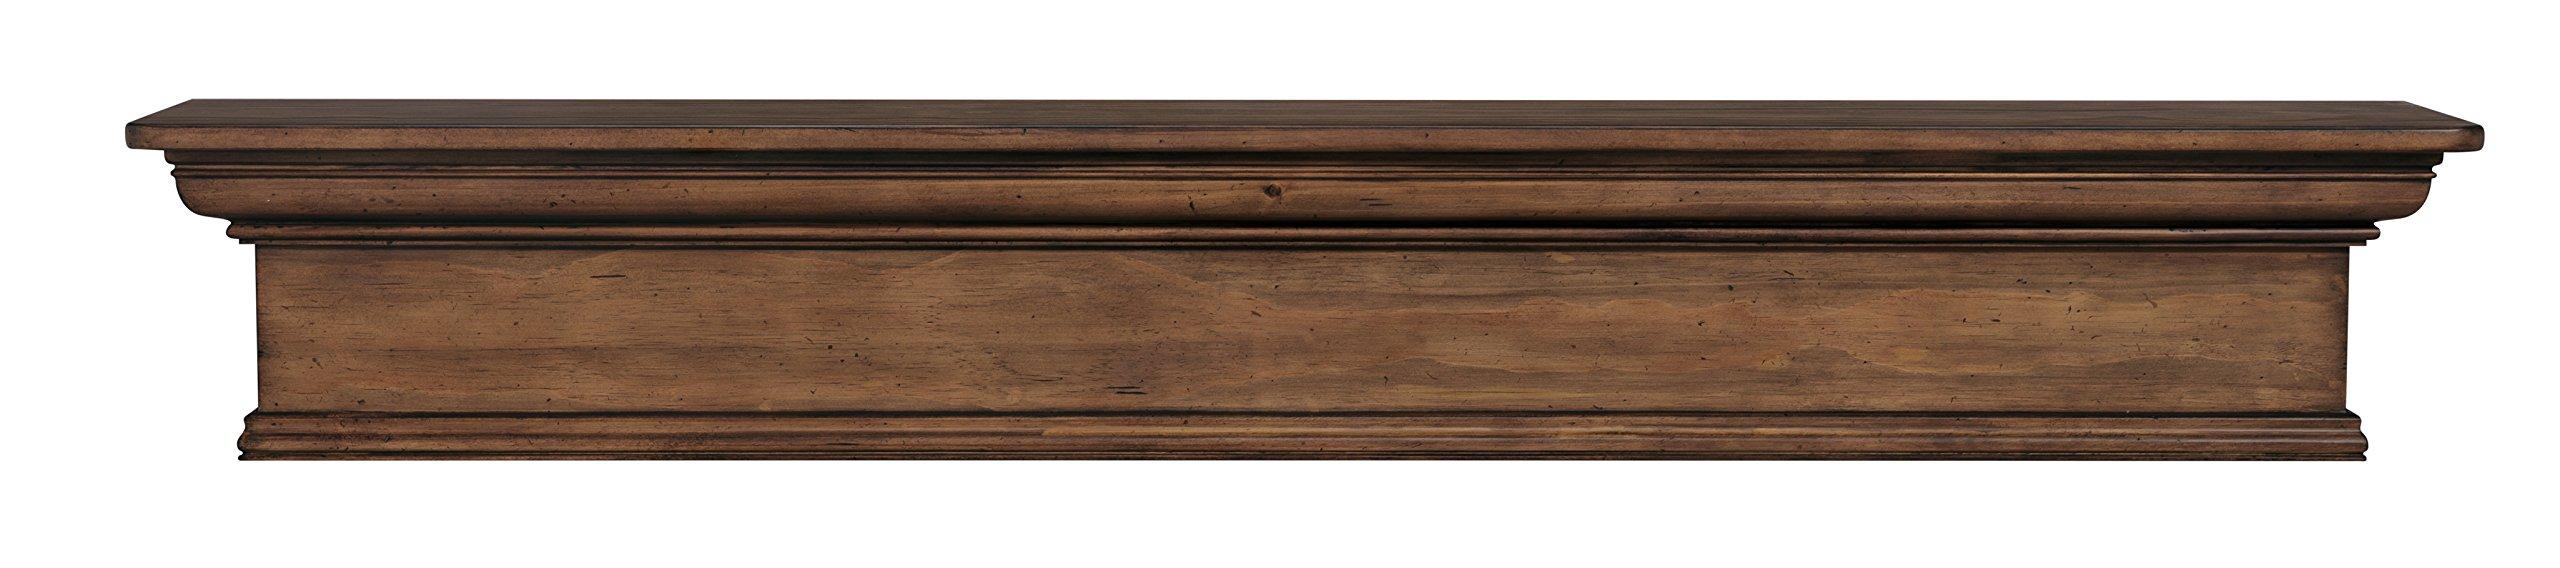 Pearl Mantels 420-72-15 Savannah Mantel Shelf, 72-Inch, Taos Finish by Pearl Mantels